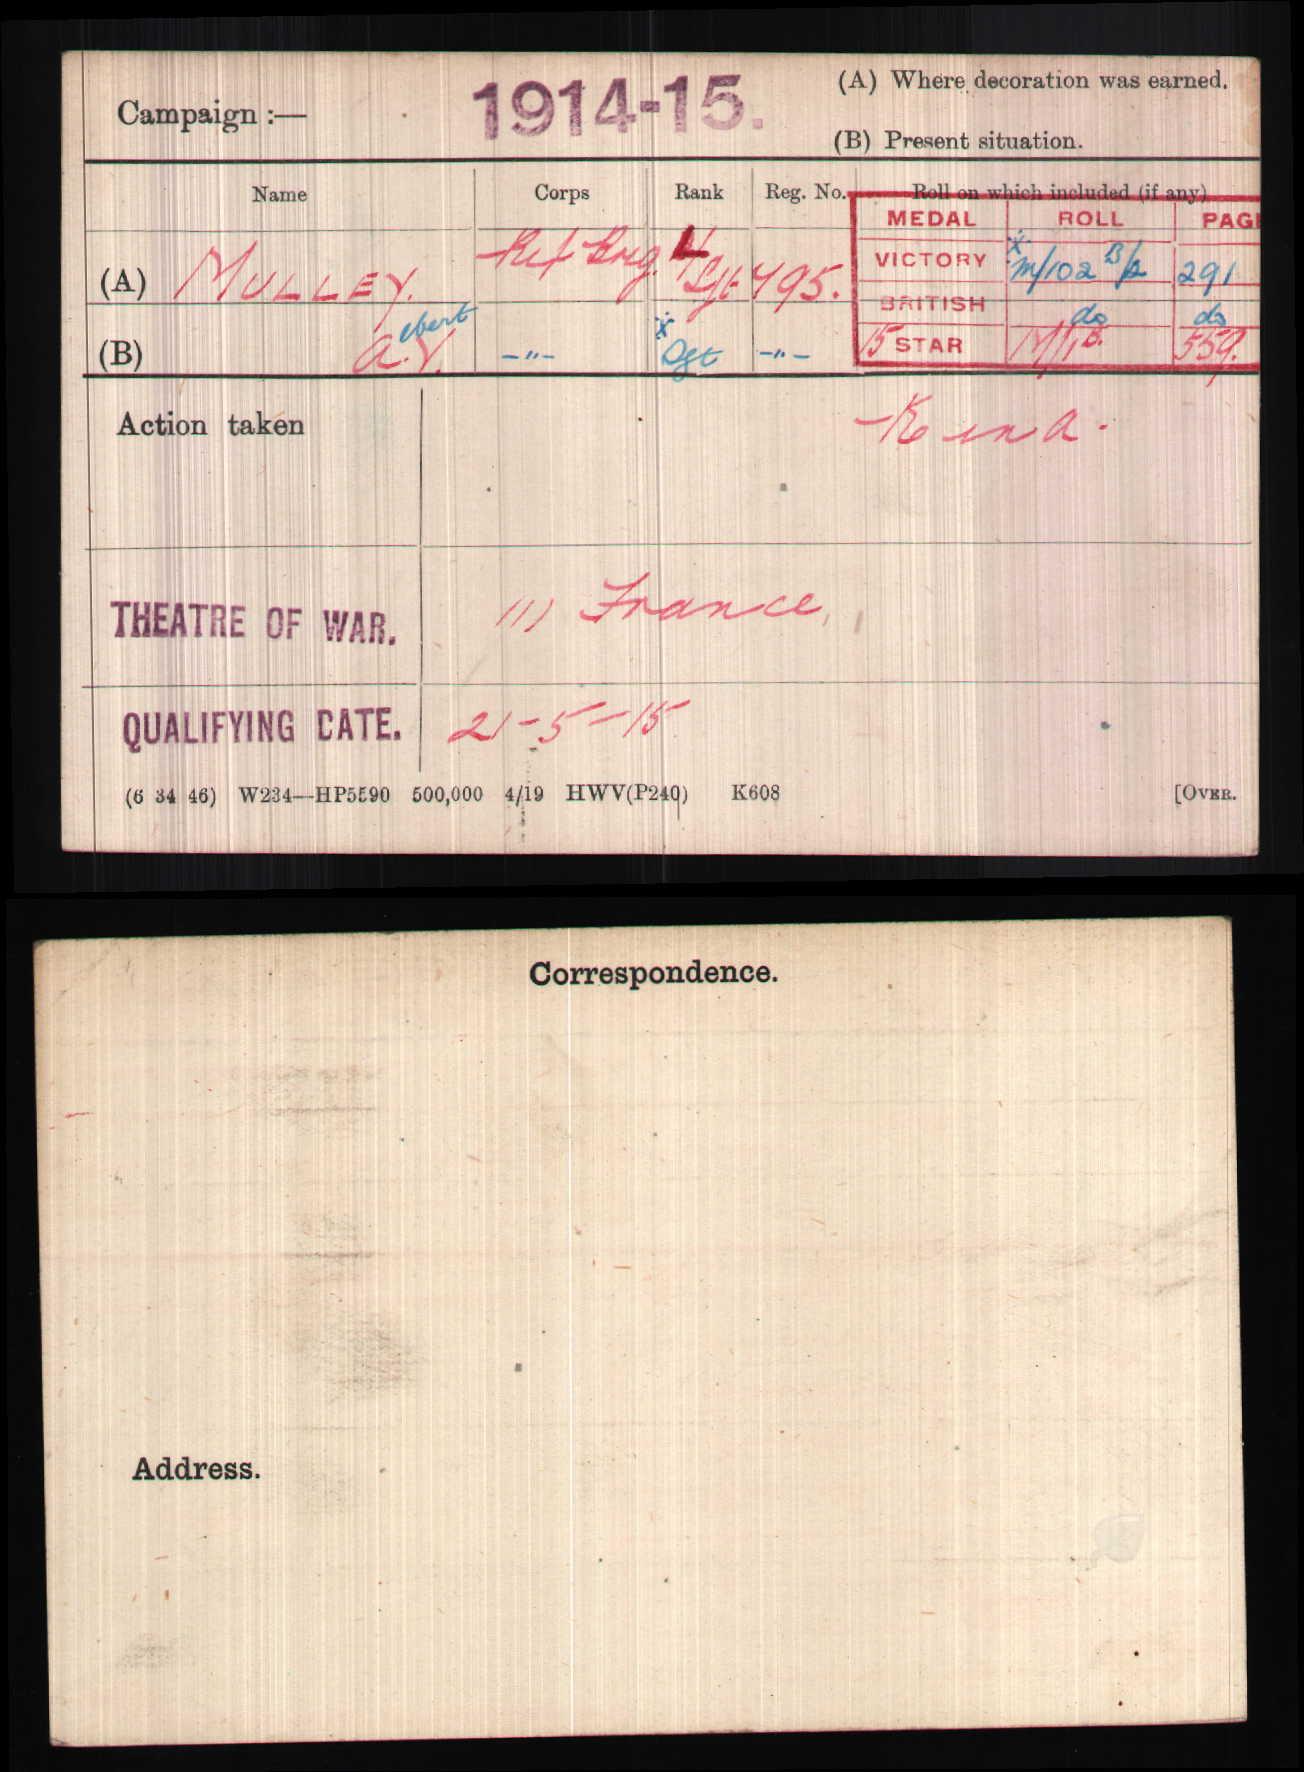 Albert Mulley medal card.jpg